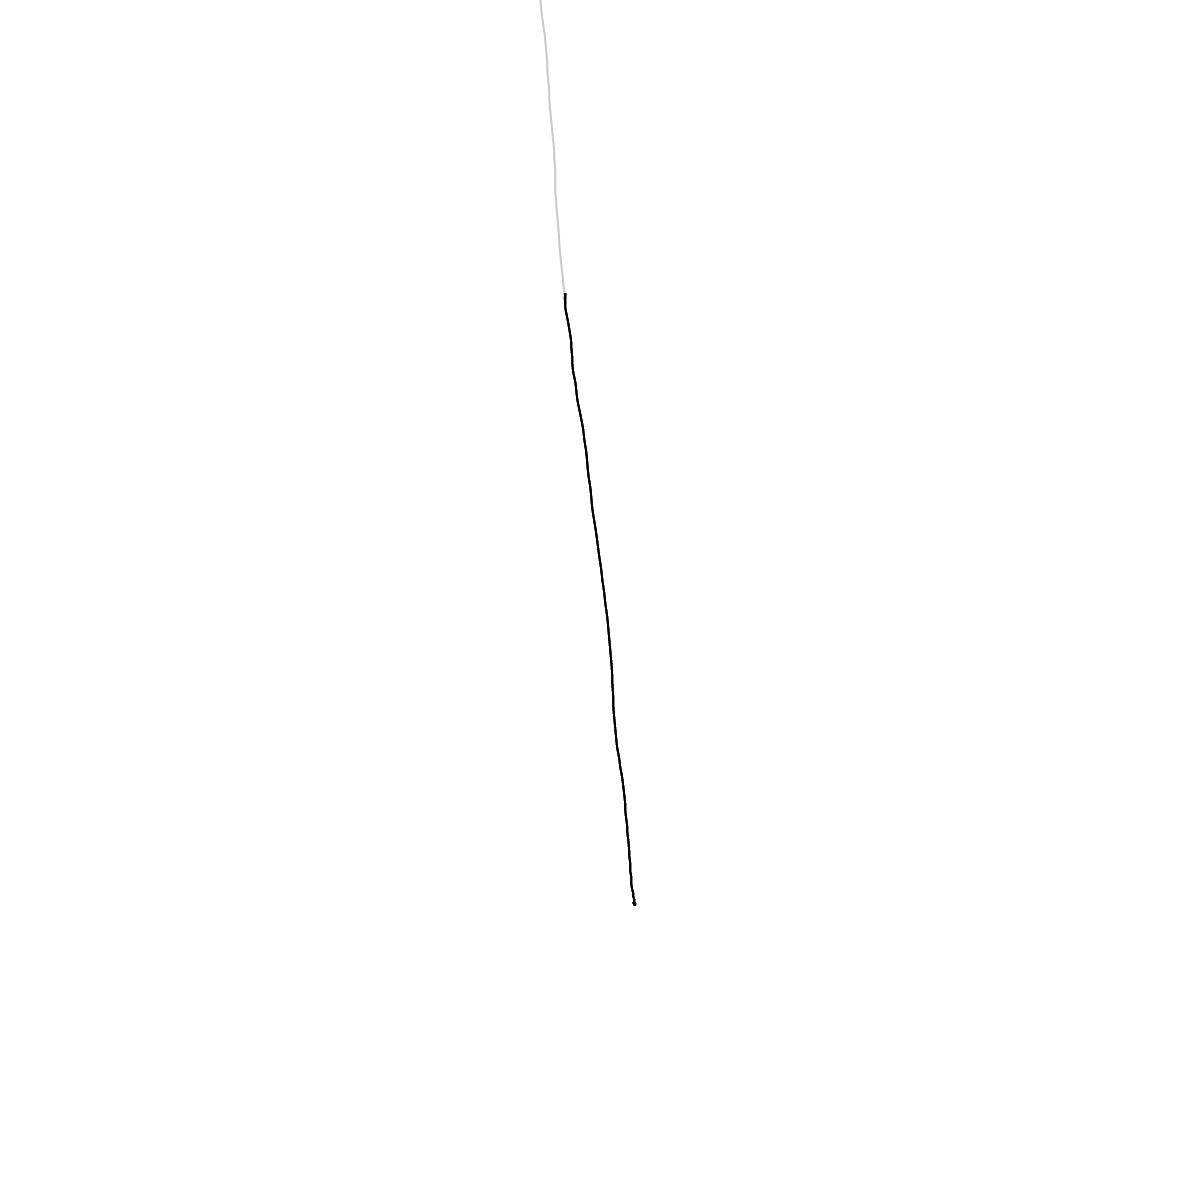 BAAAM drawing#14782 lat:52.4754371643066400lng: 13.4063434600830080